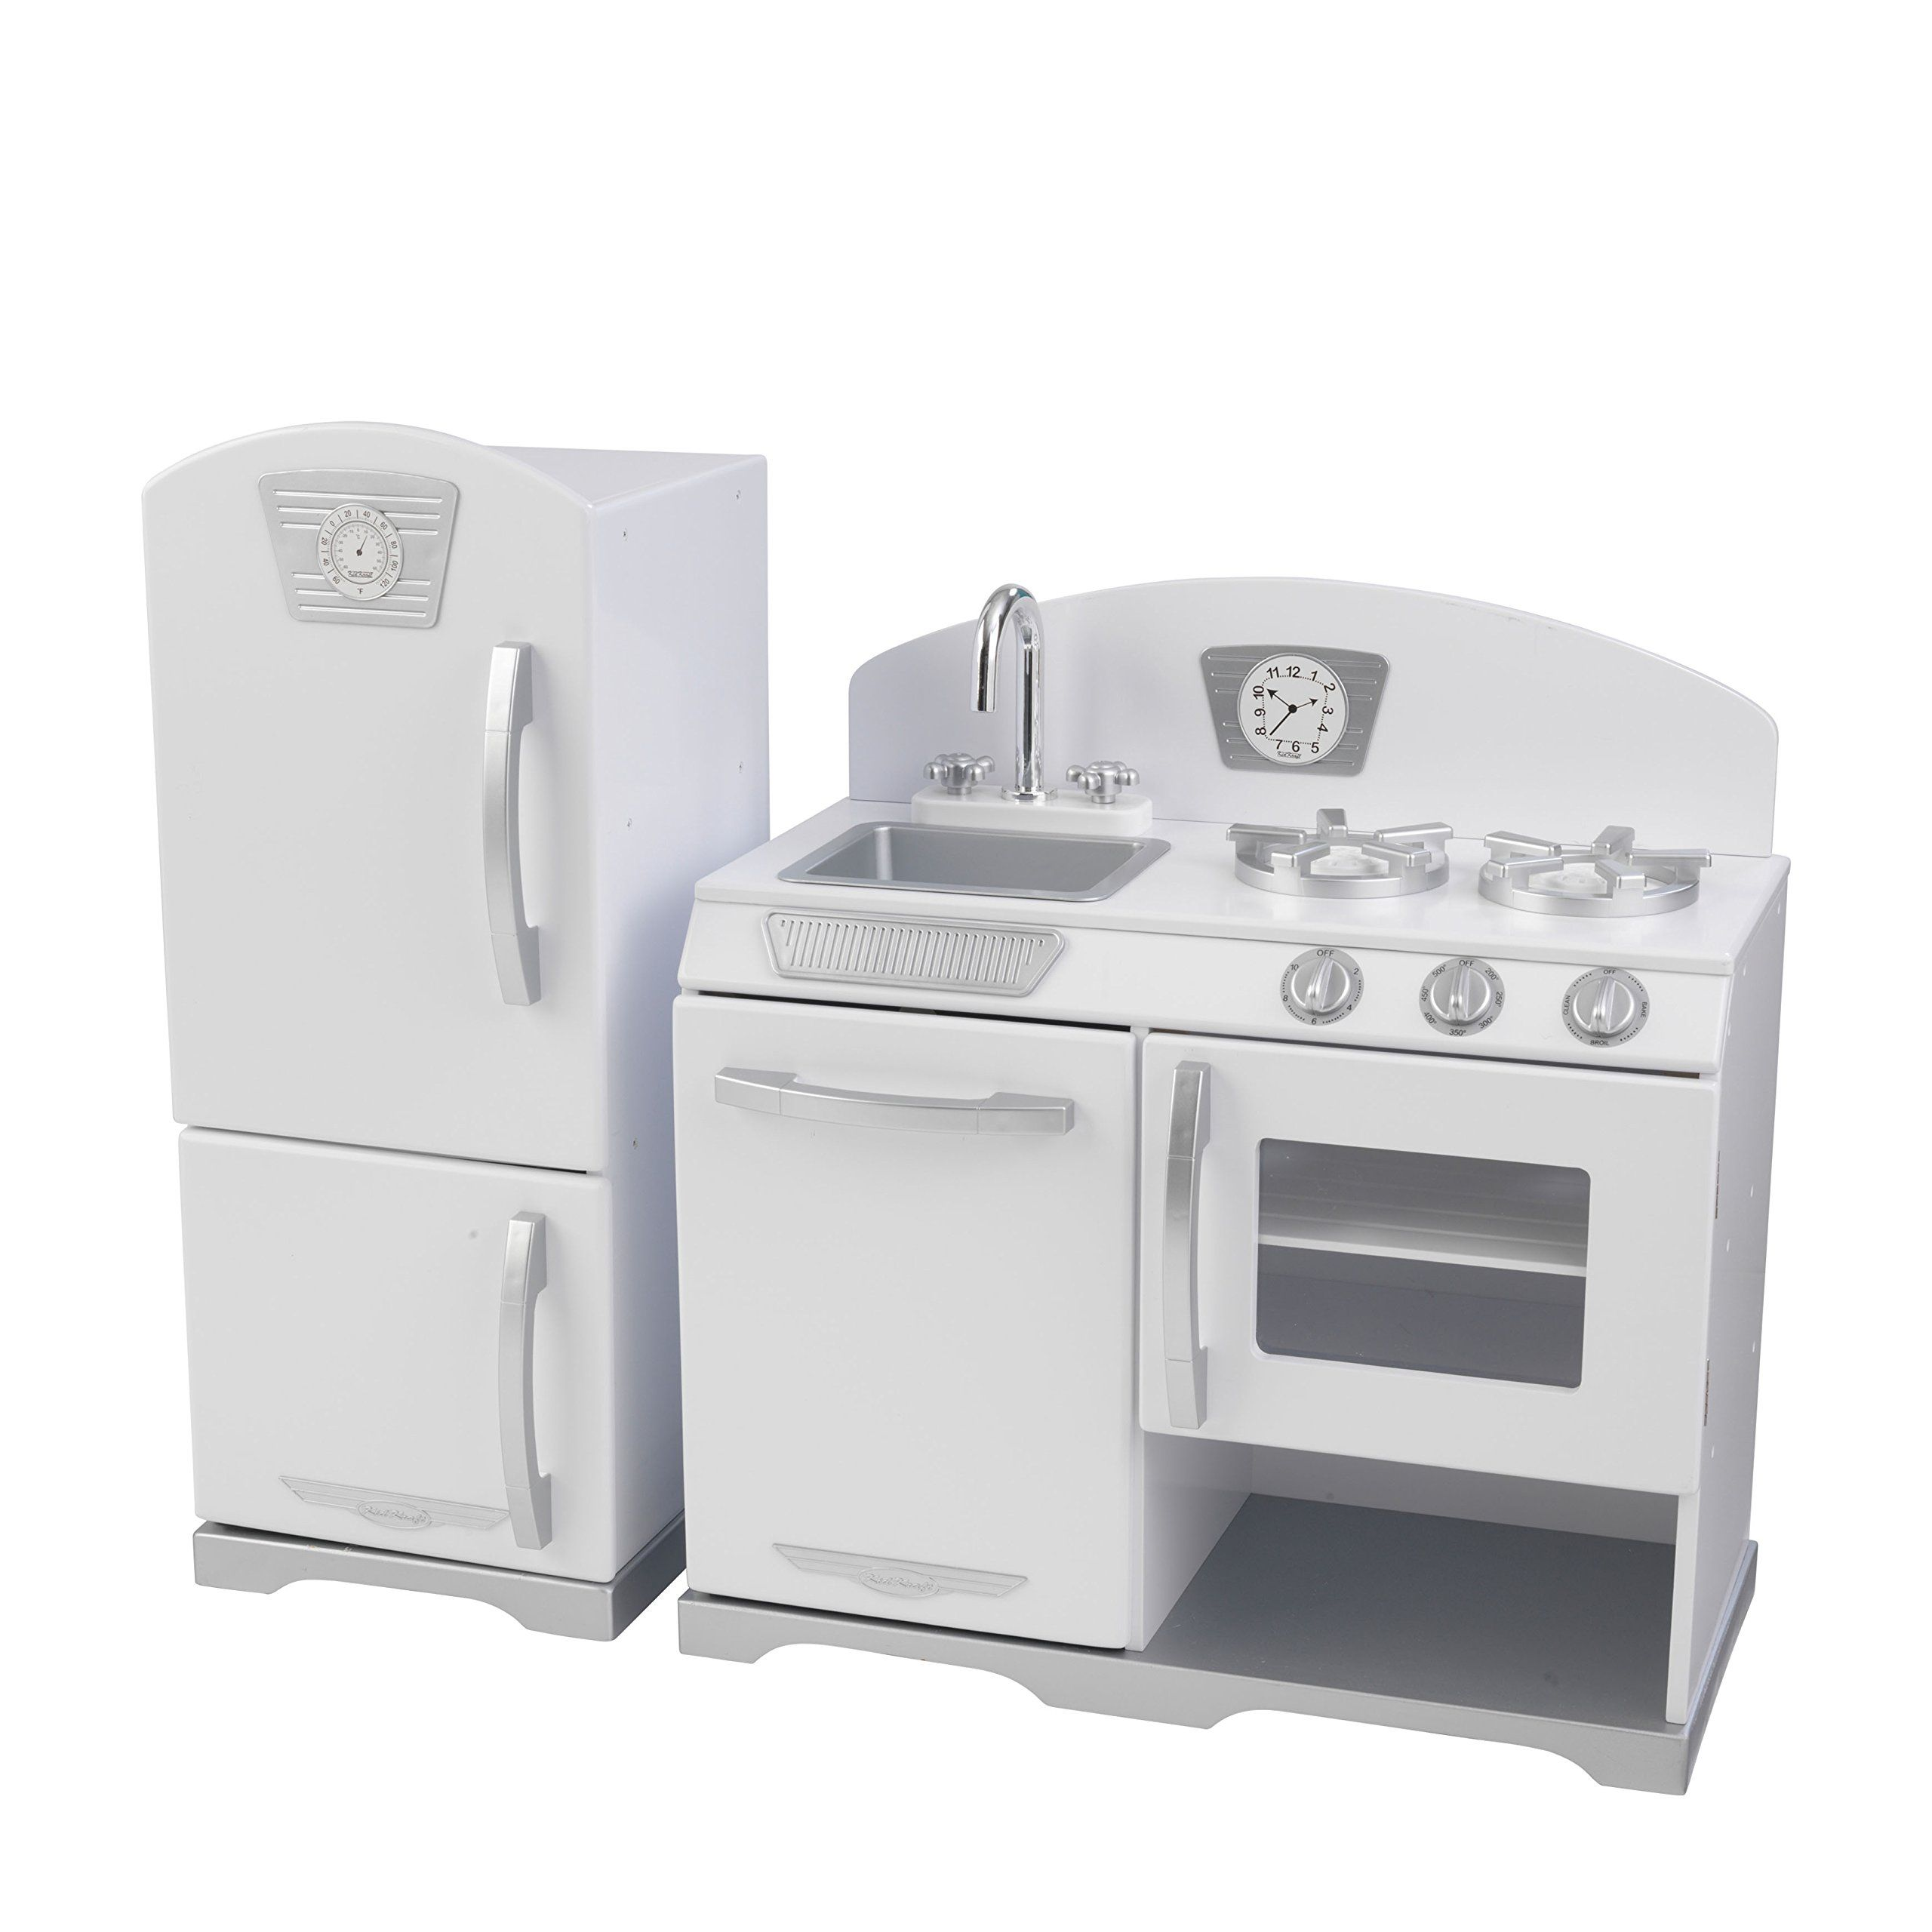 KidKraft Retro Kitchen and Refrigerator (2-Piece), White   Kiddos ...